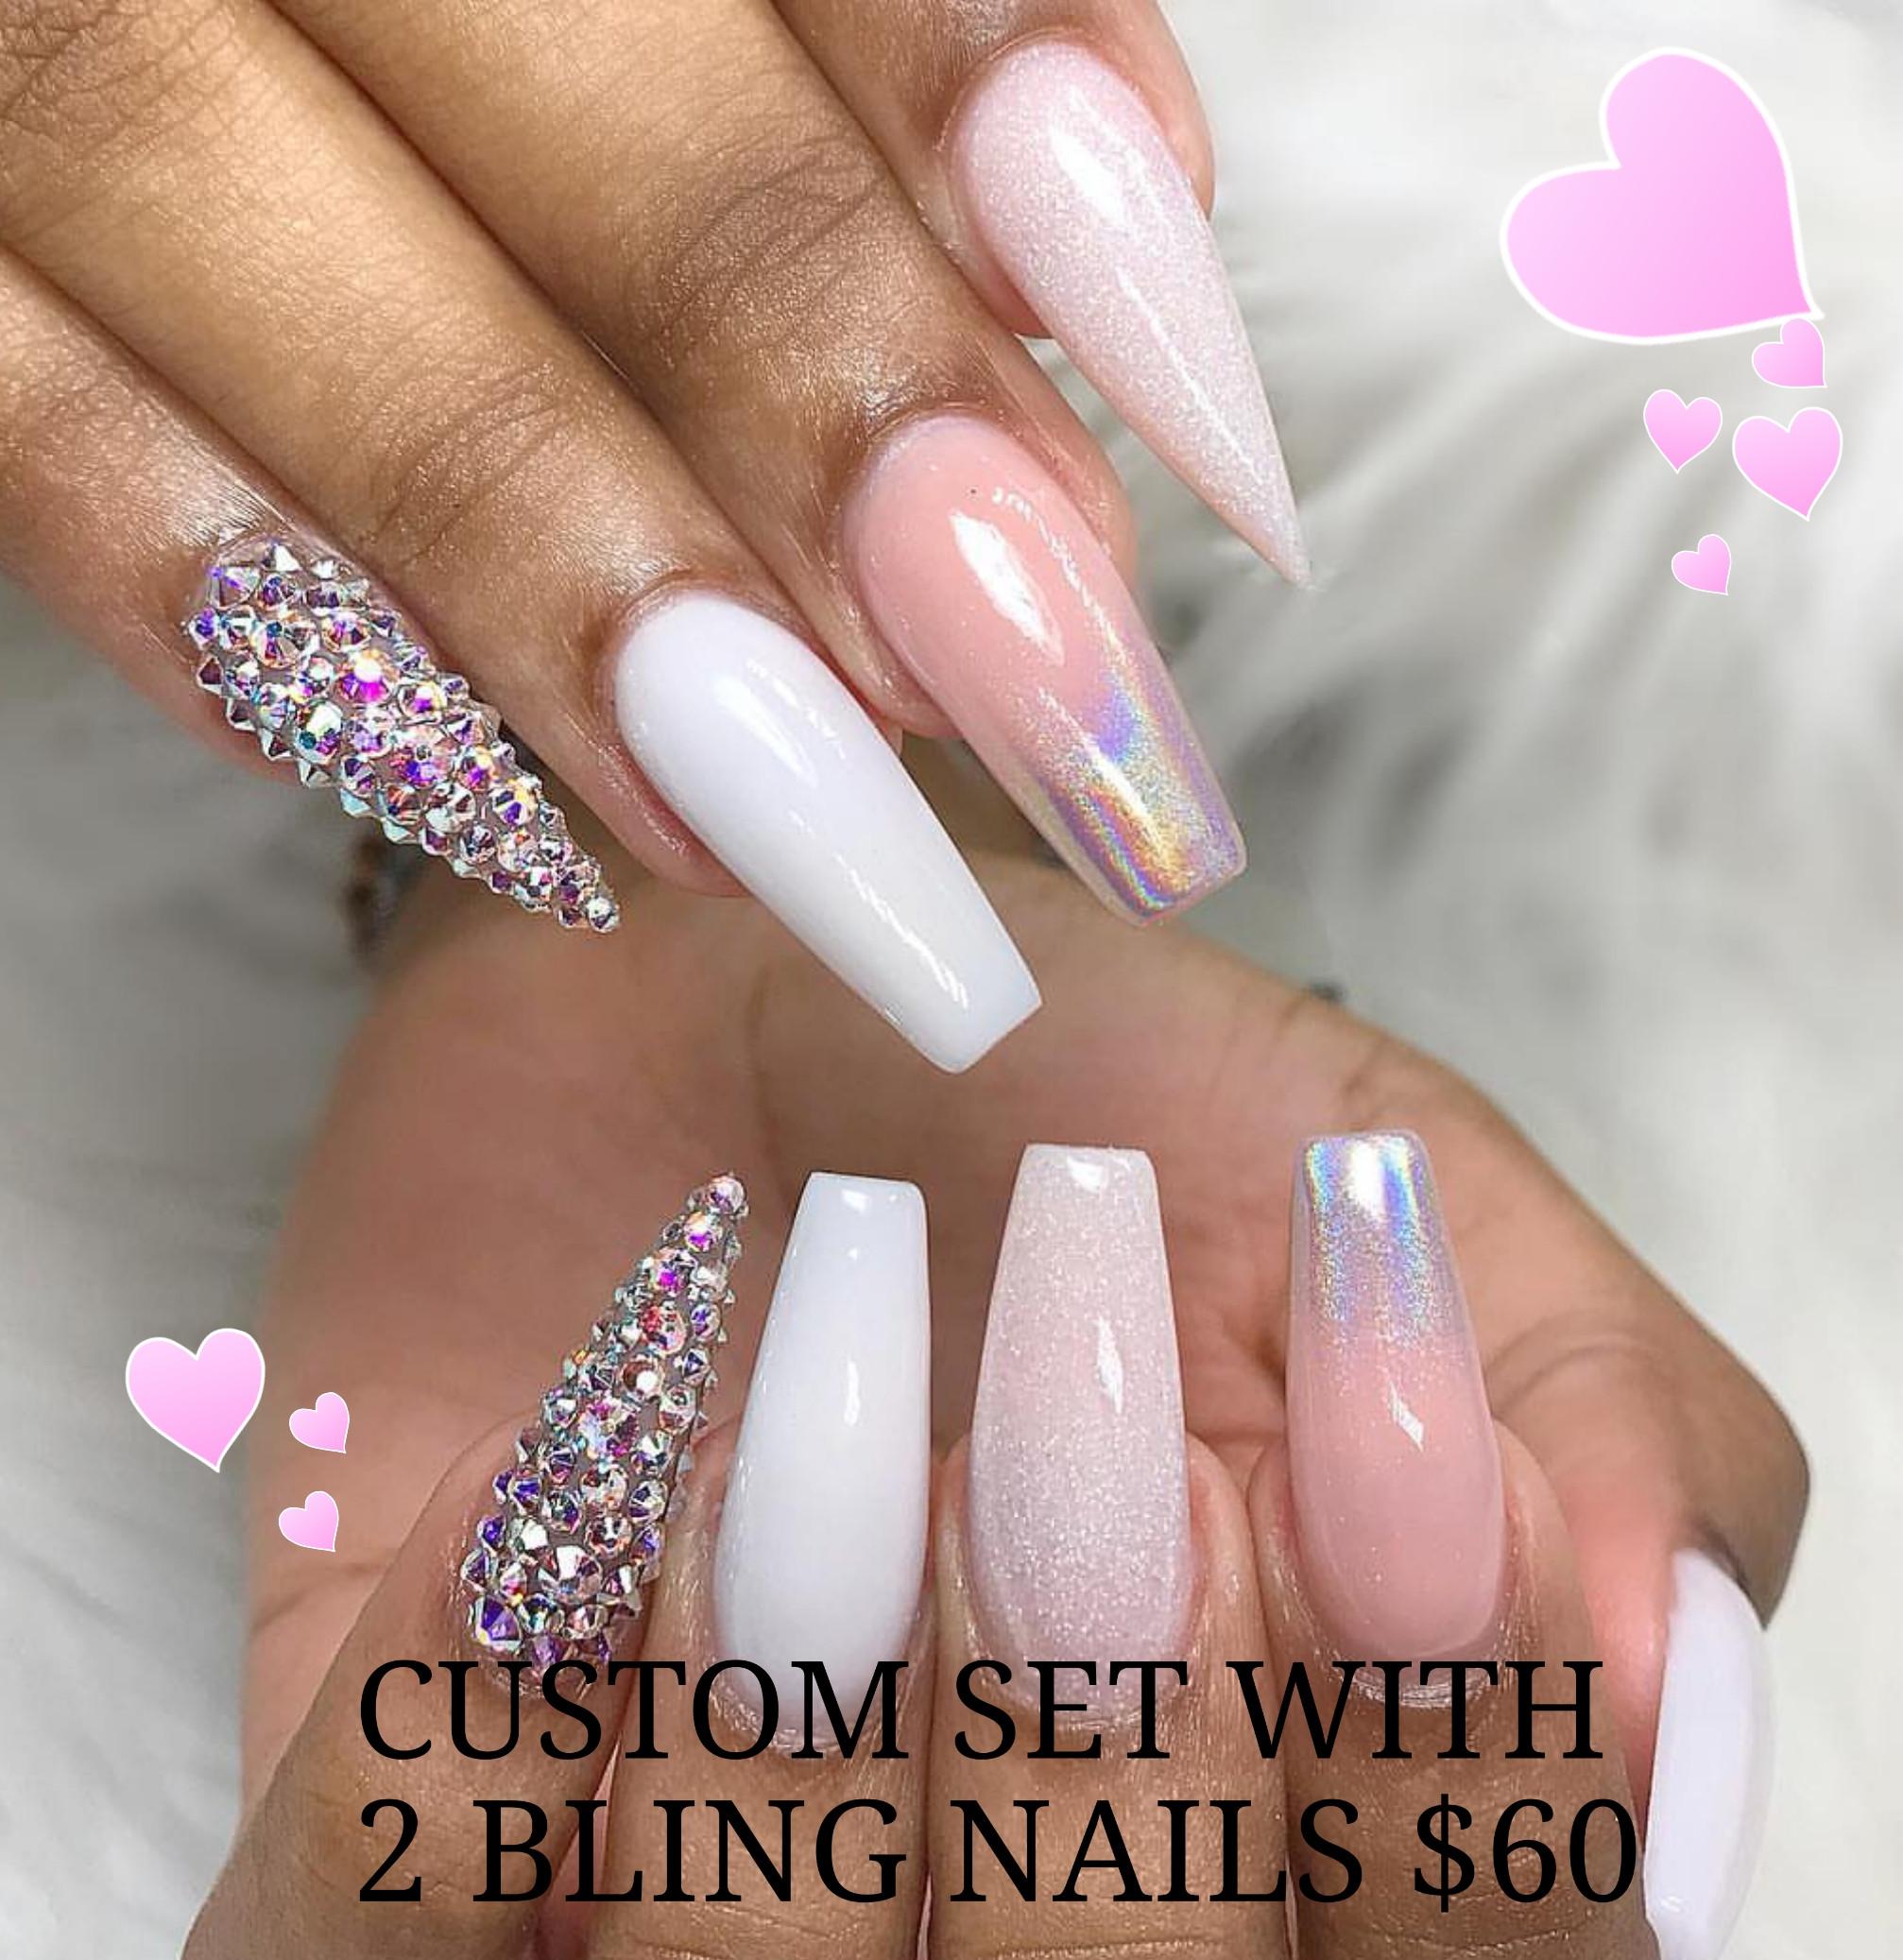 Custom set or fill-in 2 bling nails $70+